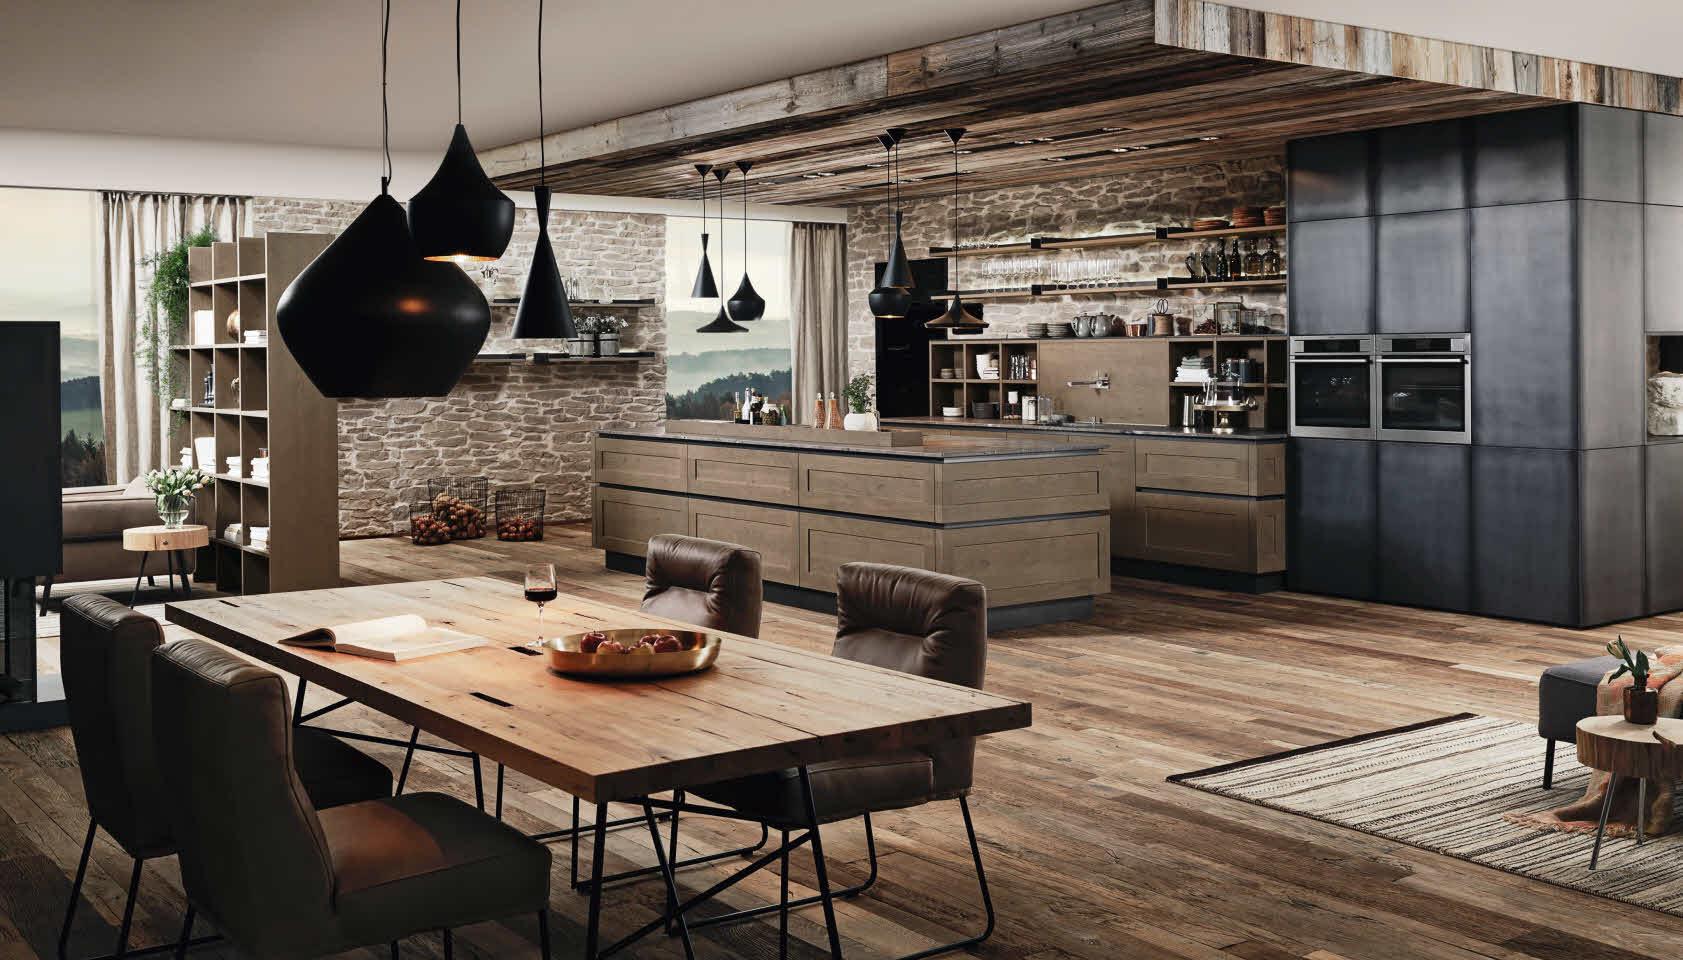 best vito küchen nobilia photos - house design ideas ...